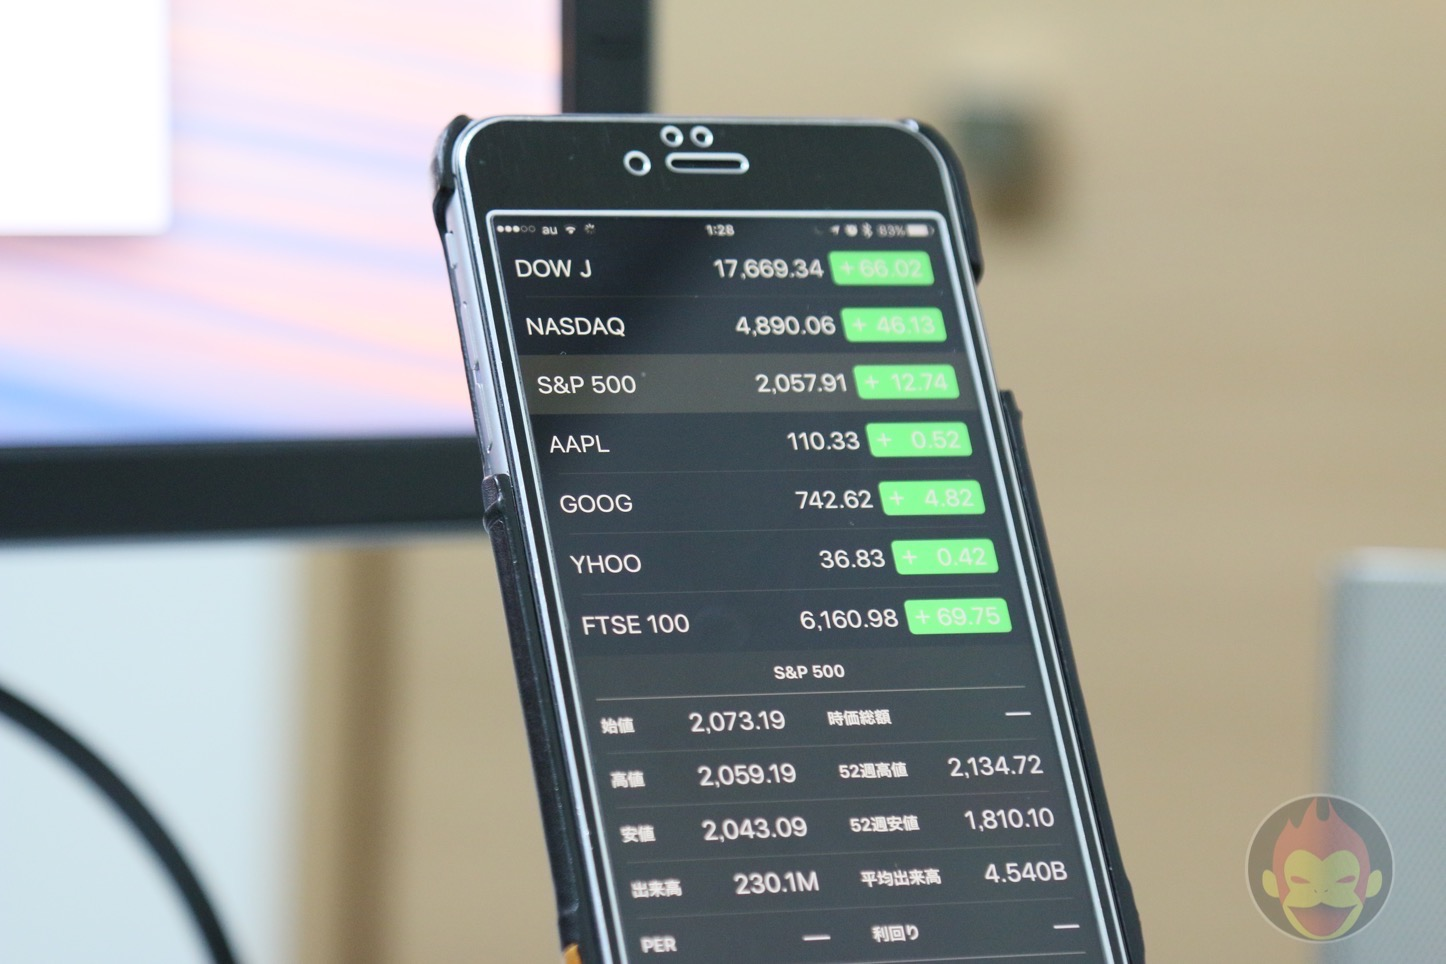 Stock App iOS